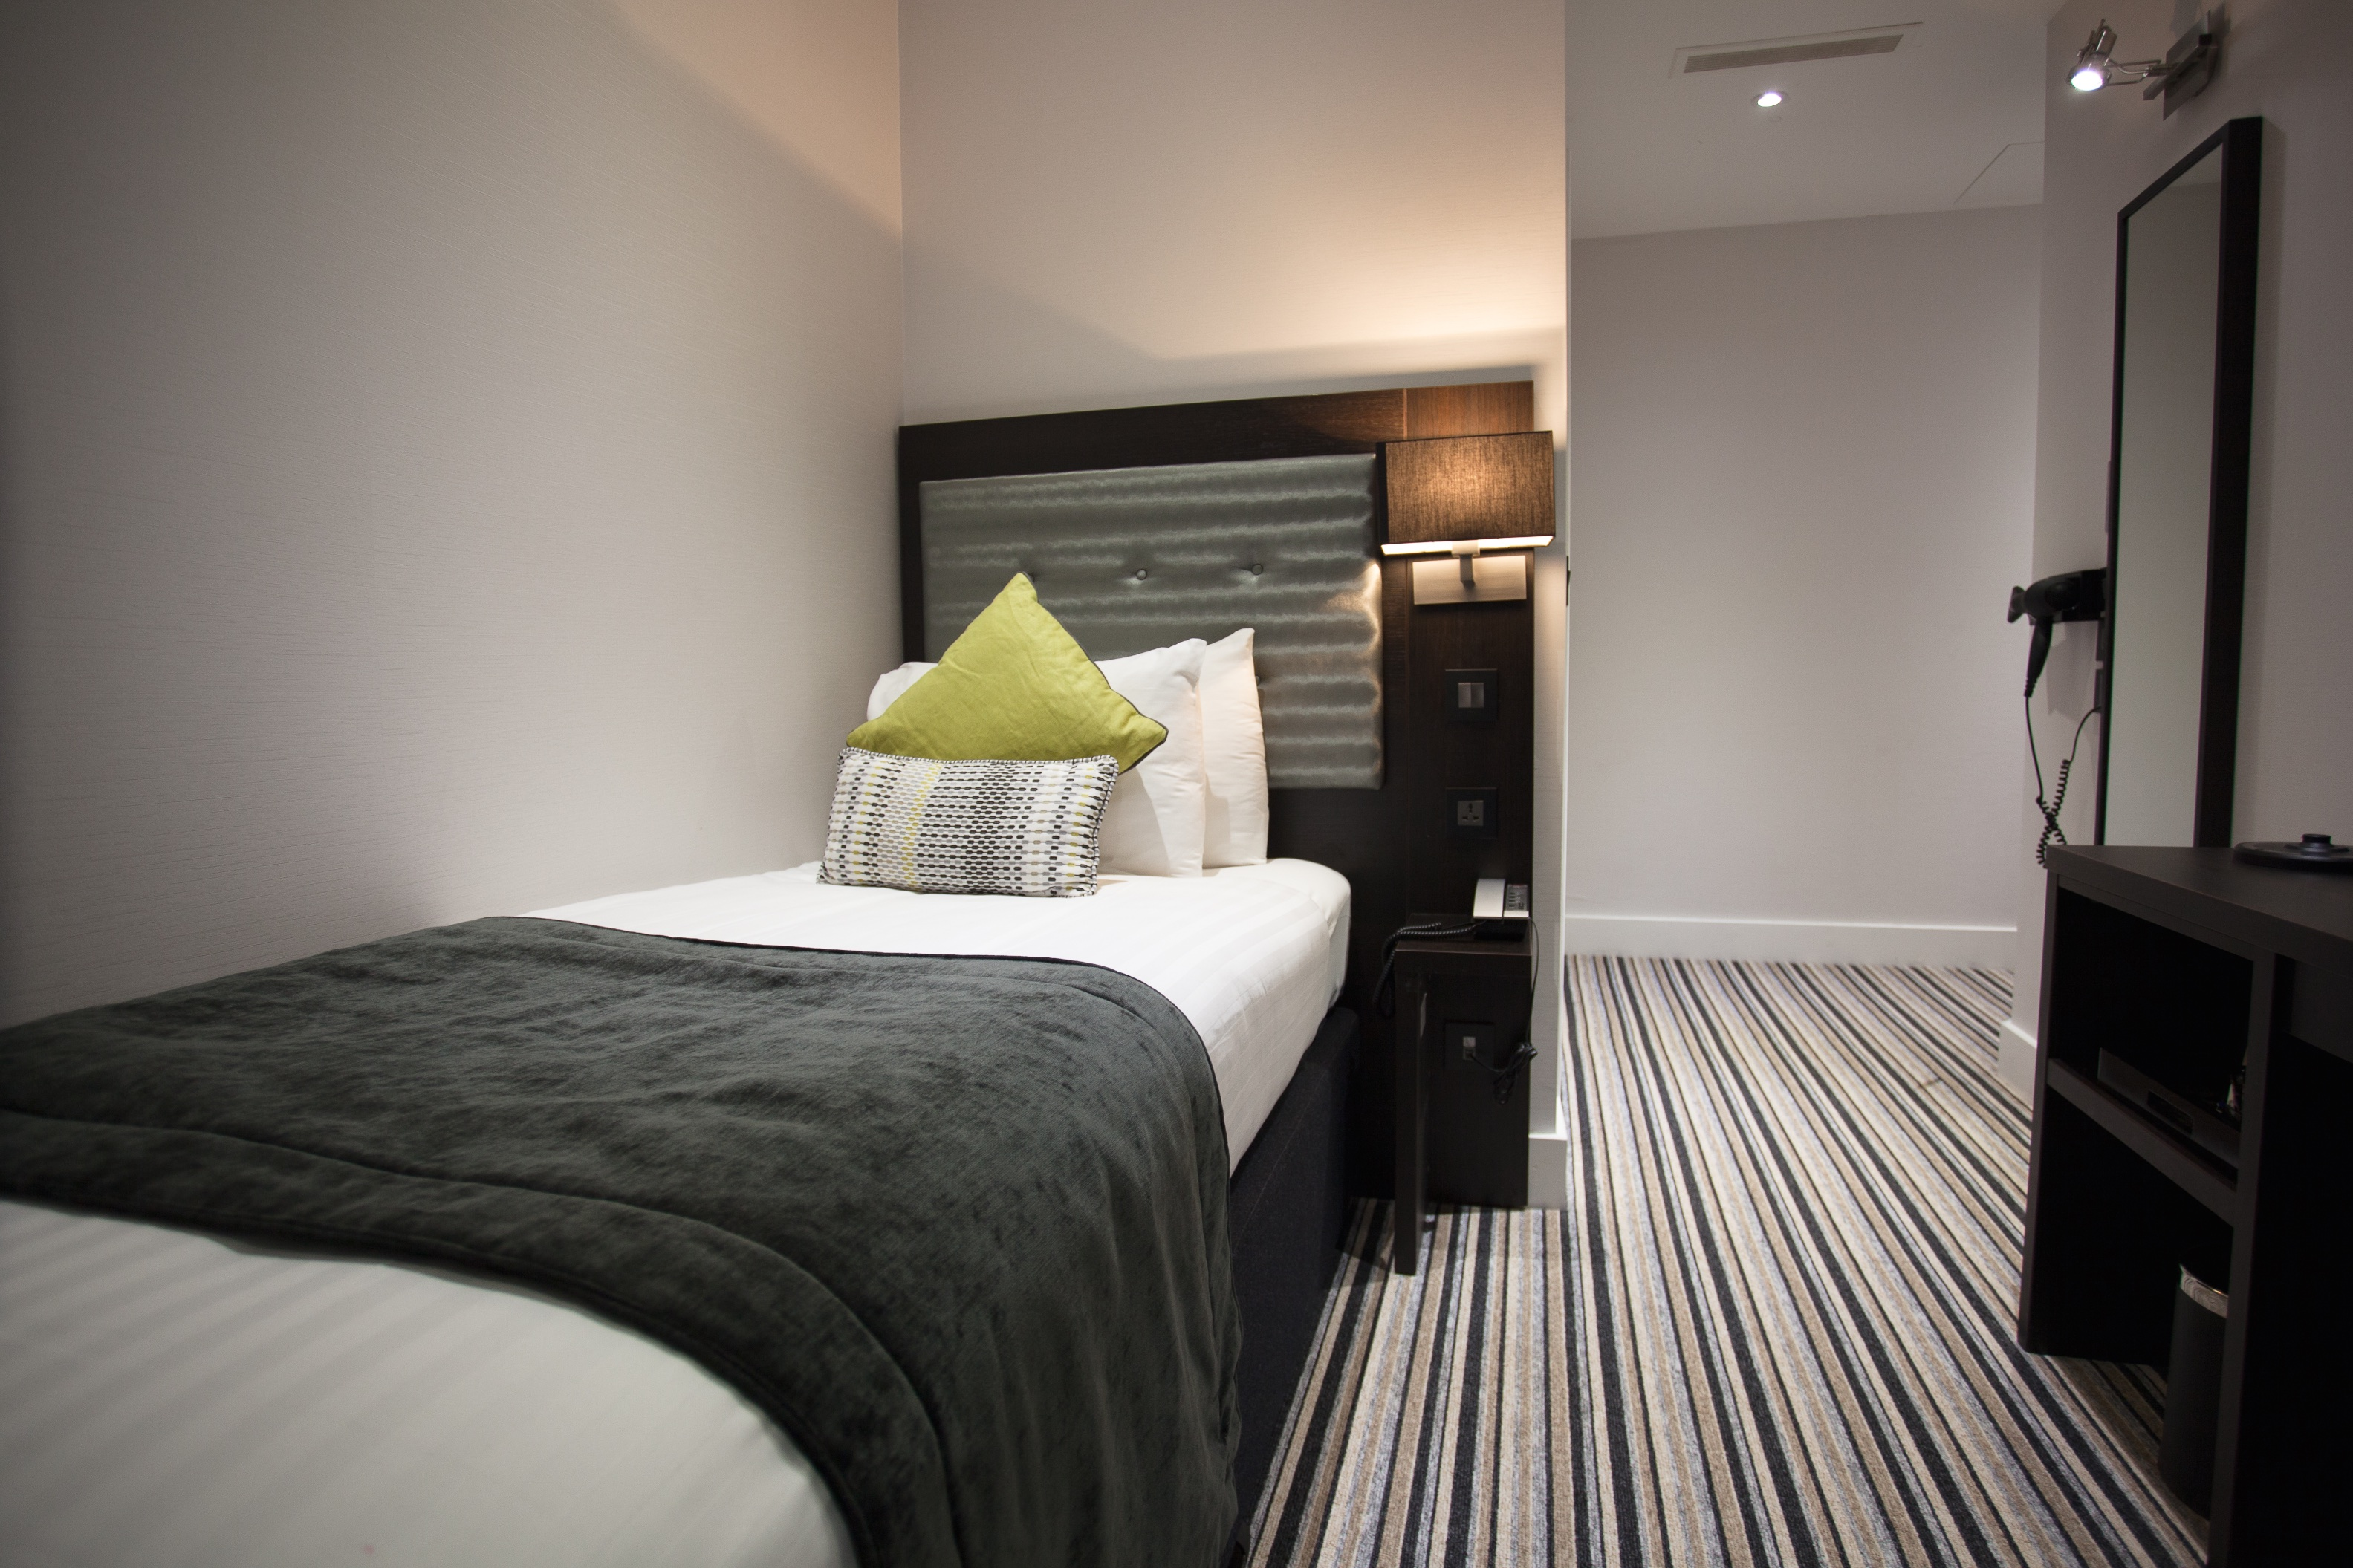 The W14 Kensington Hotel